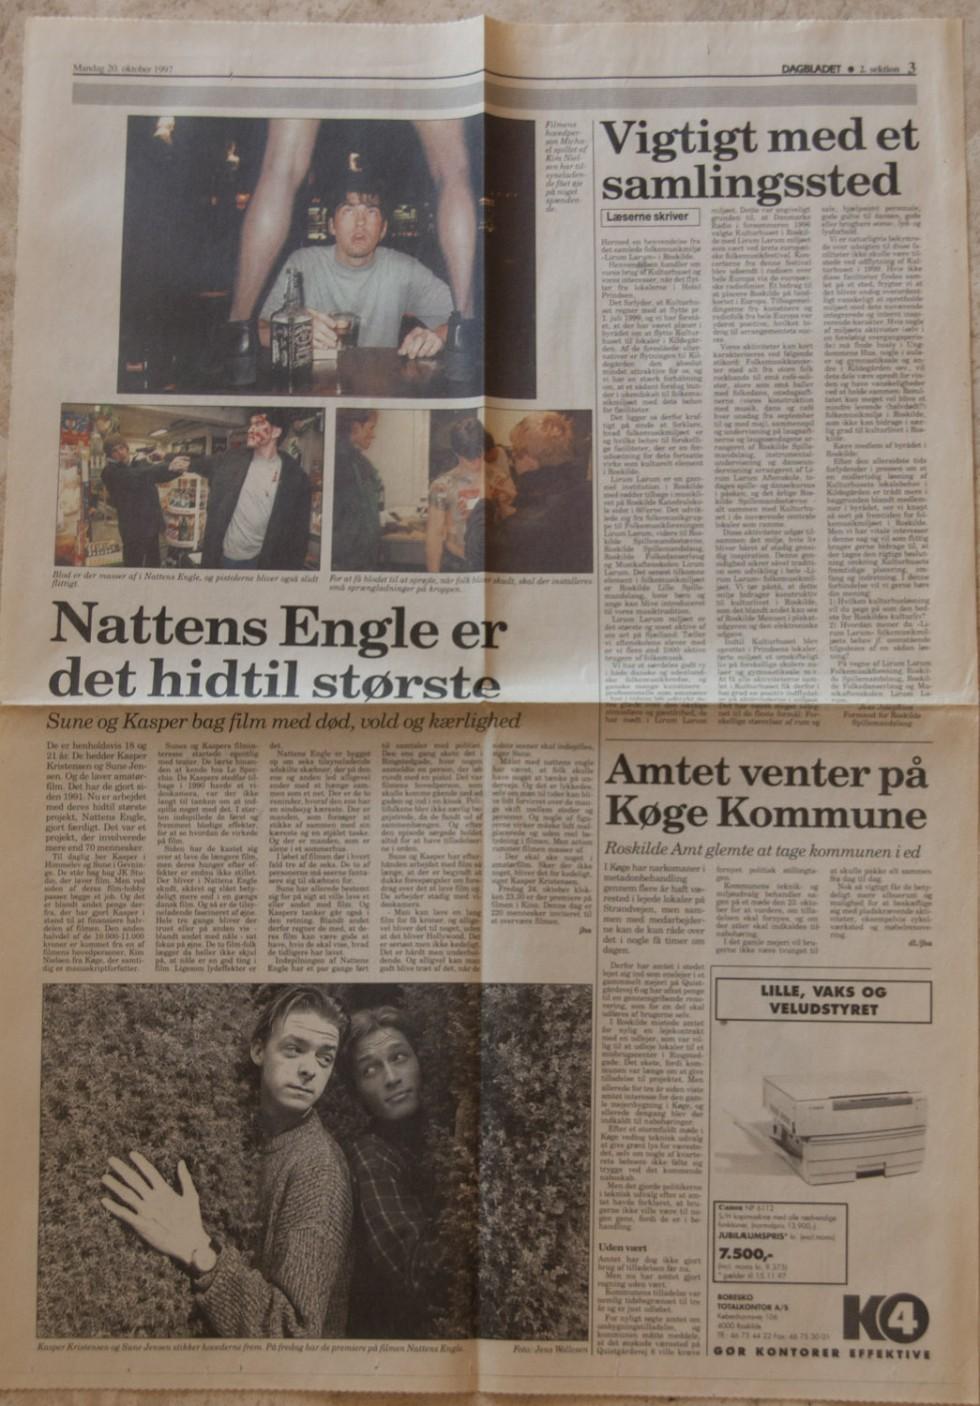 Artikel om Nattens Engle fra Dagbladet Roskilde tidende 1997.